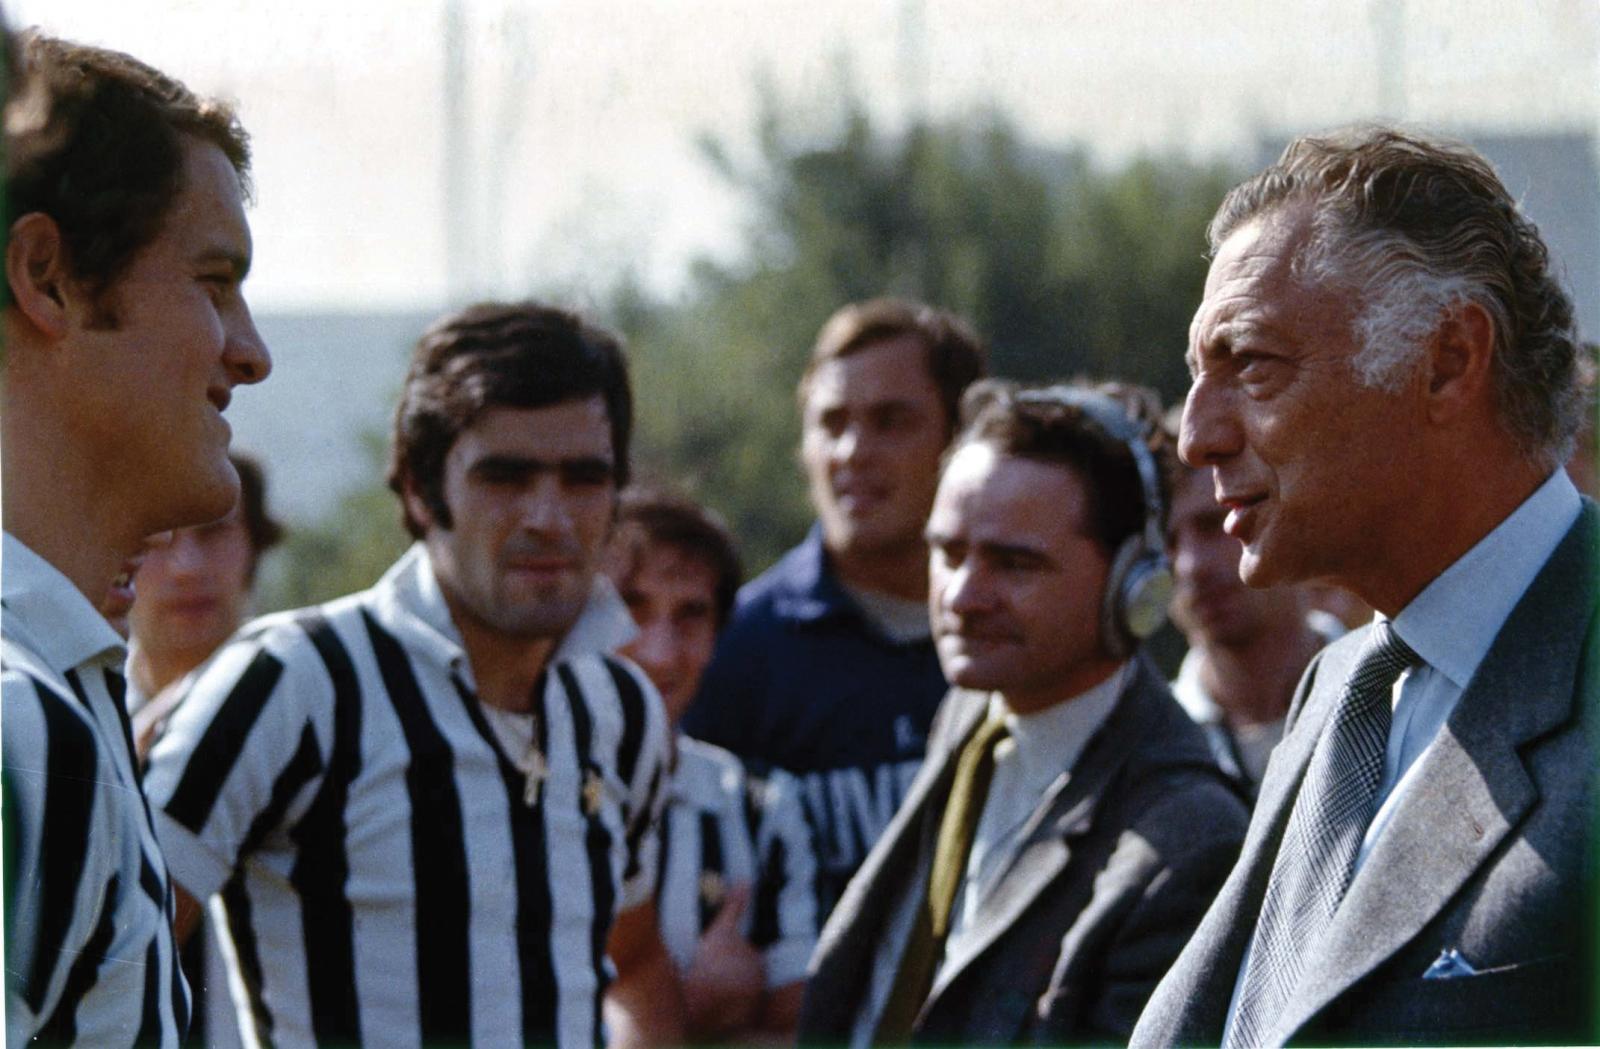 FOR-WEB_Juventus_1968_Gianni-Agnelli_photocredit_LaPresse